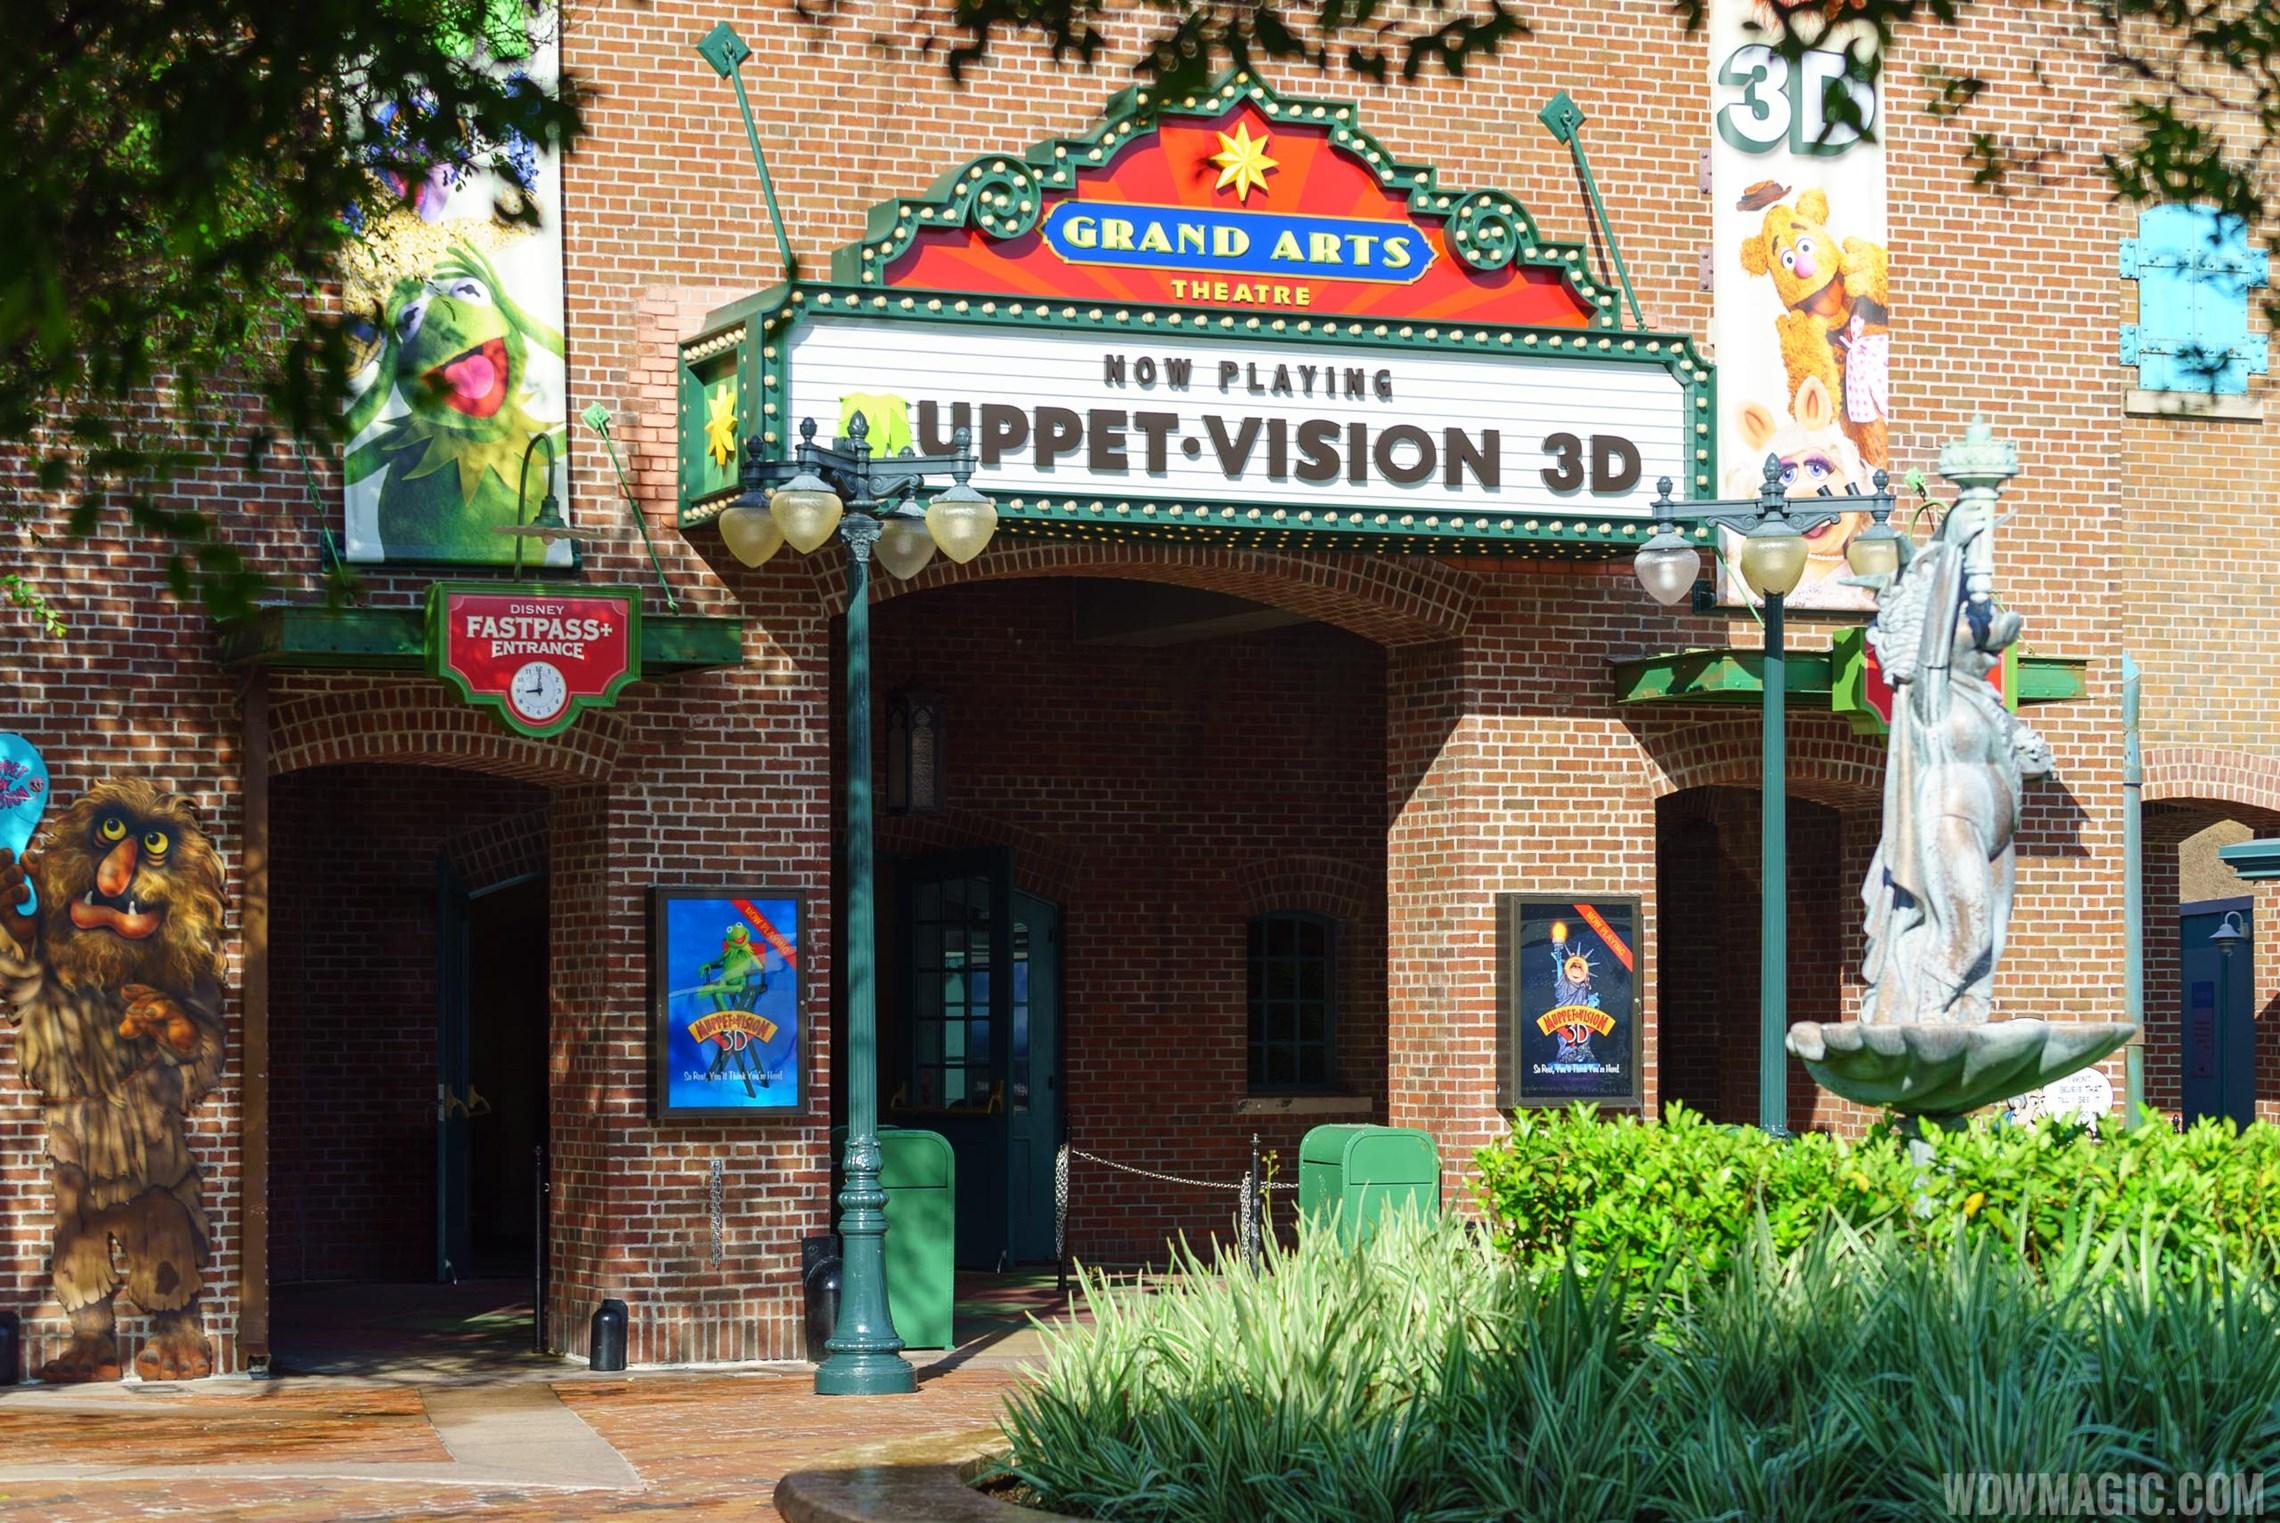 MuppetVision 3D closed for refurbishment